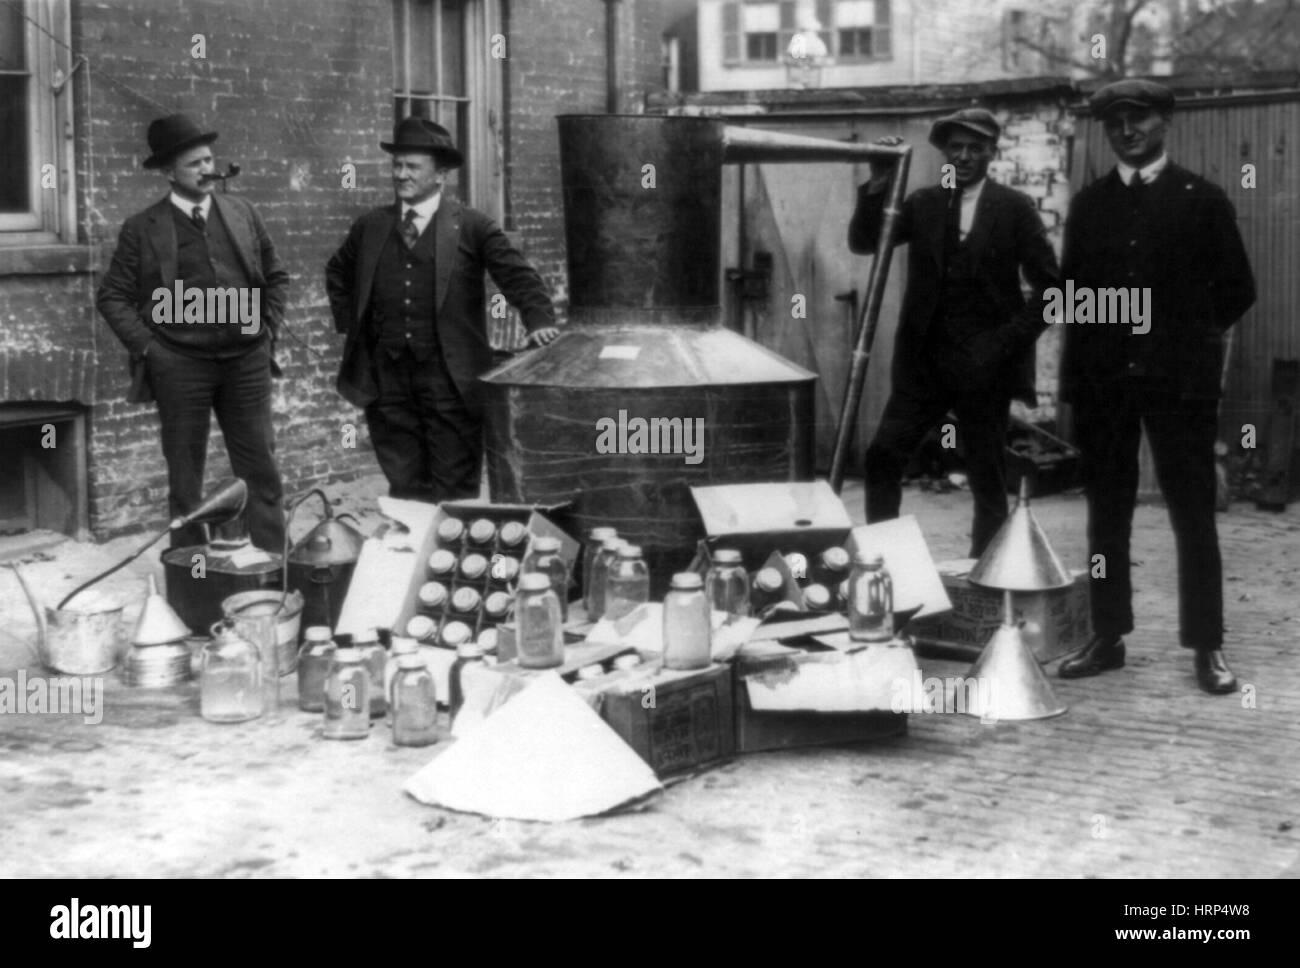 Prohibition Servicemen with Captured Still, 1922 - Stock Image